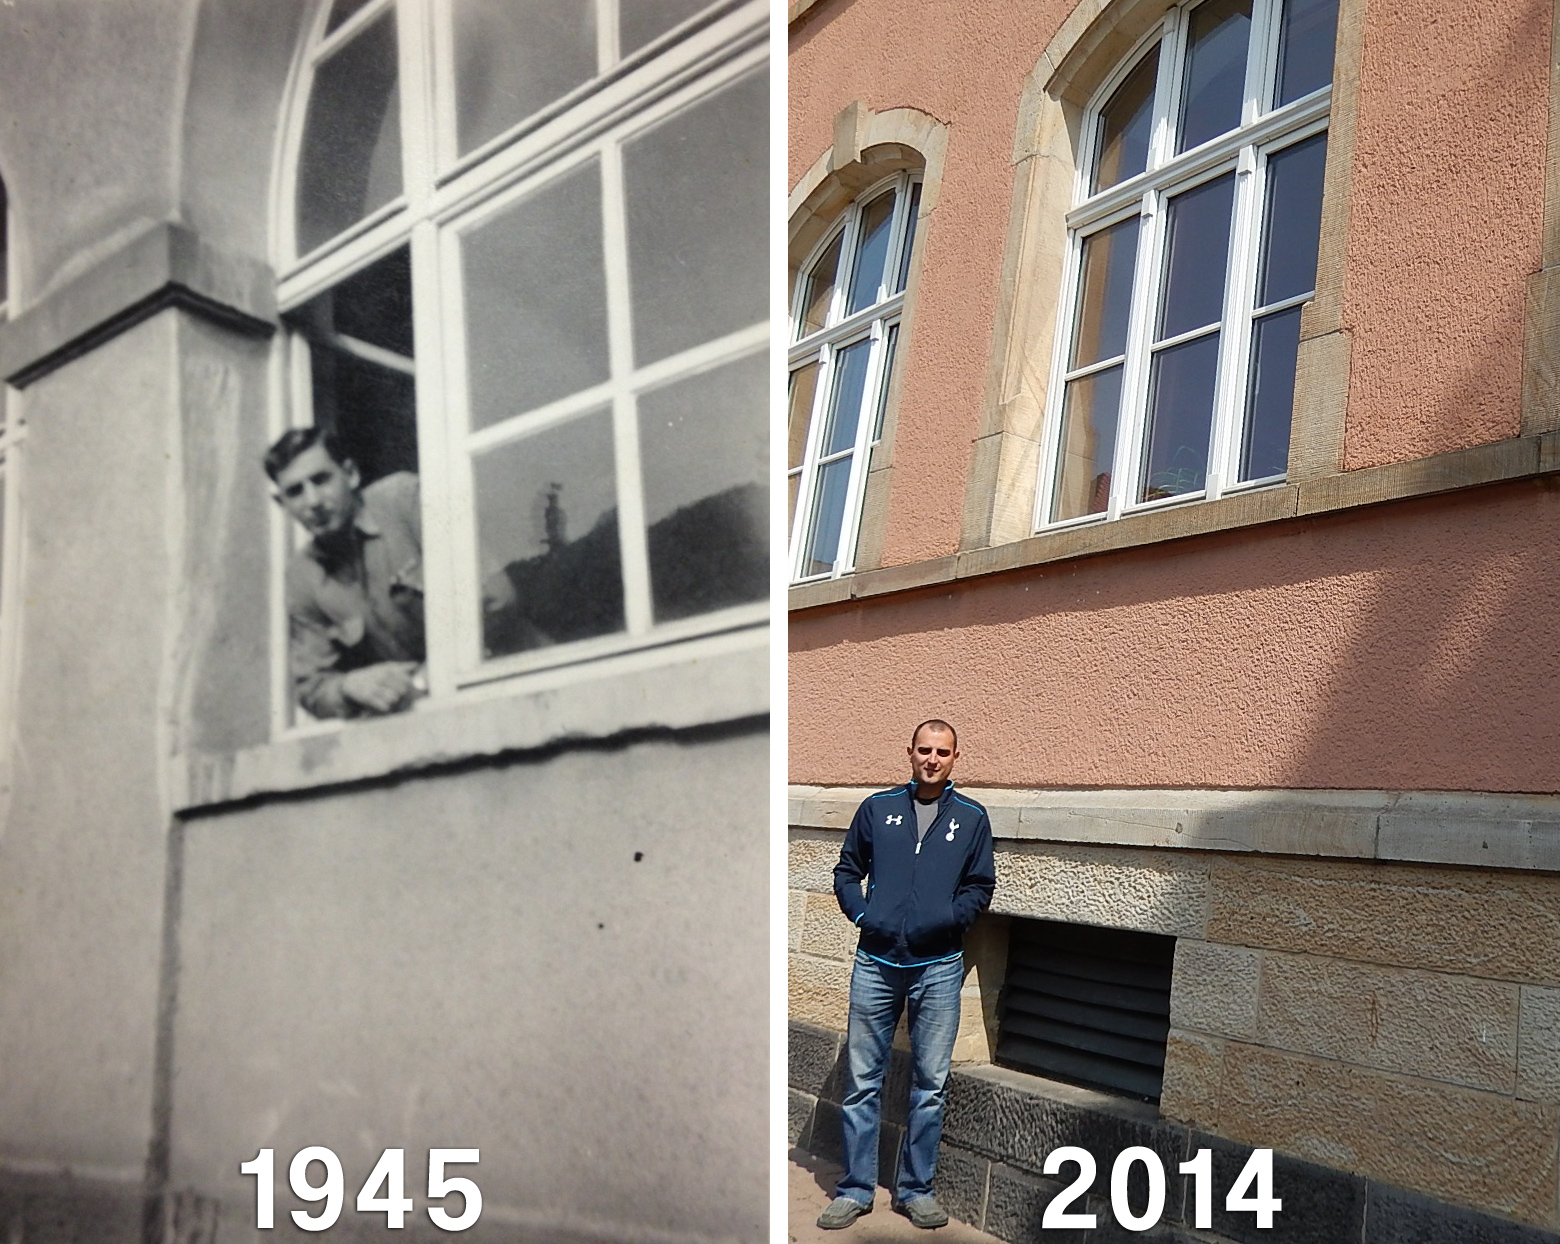 alsfeld-germany-then-now